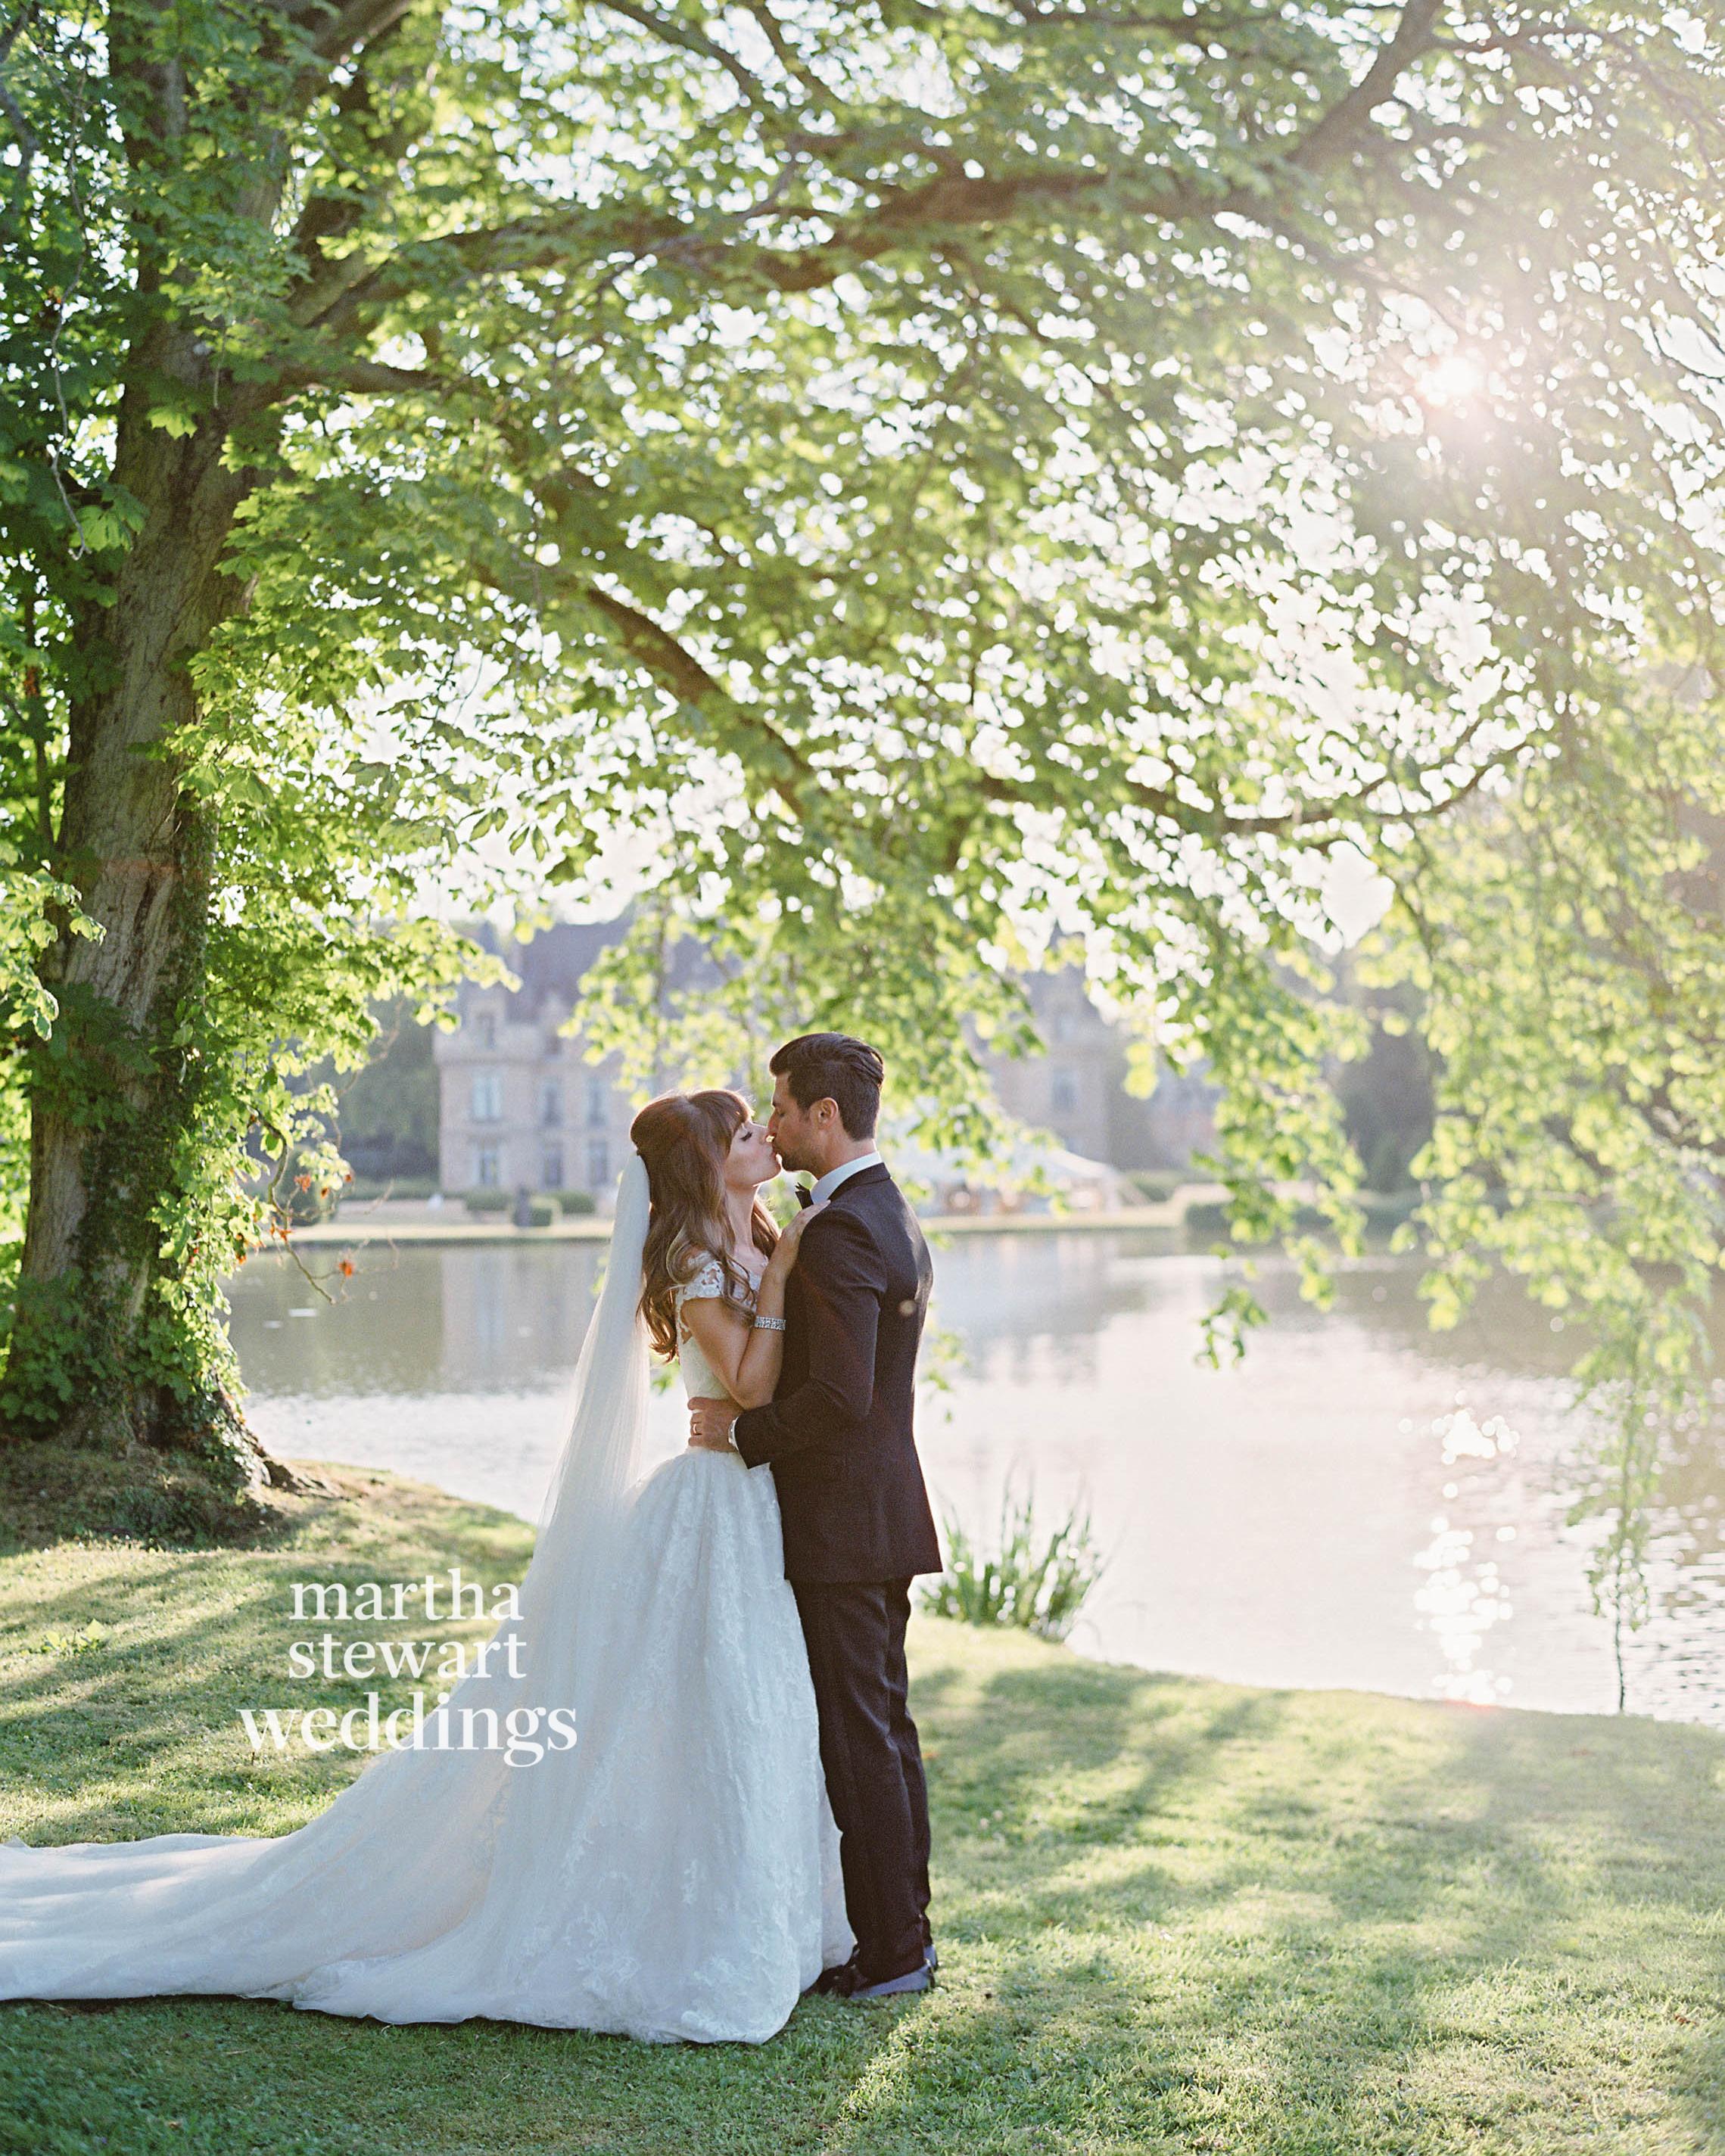 jenny-freddie-wedding-france-483-d112242-watermarked-1215.jpg